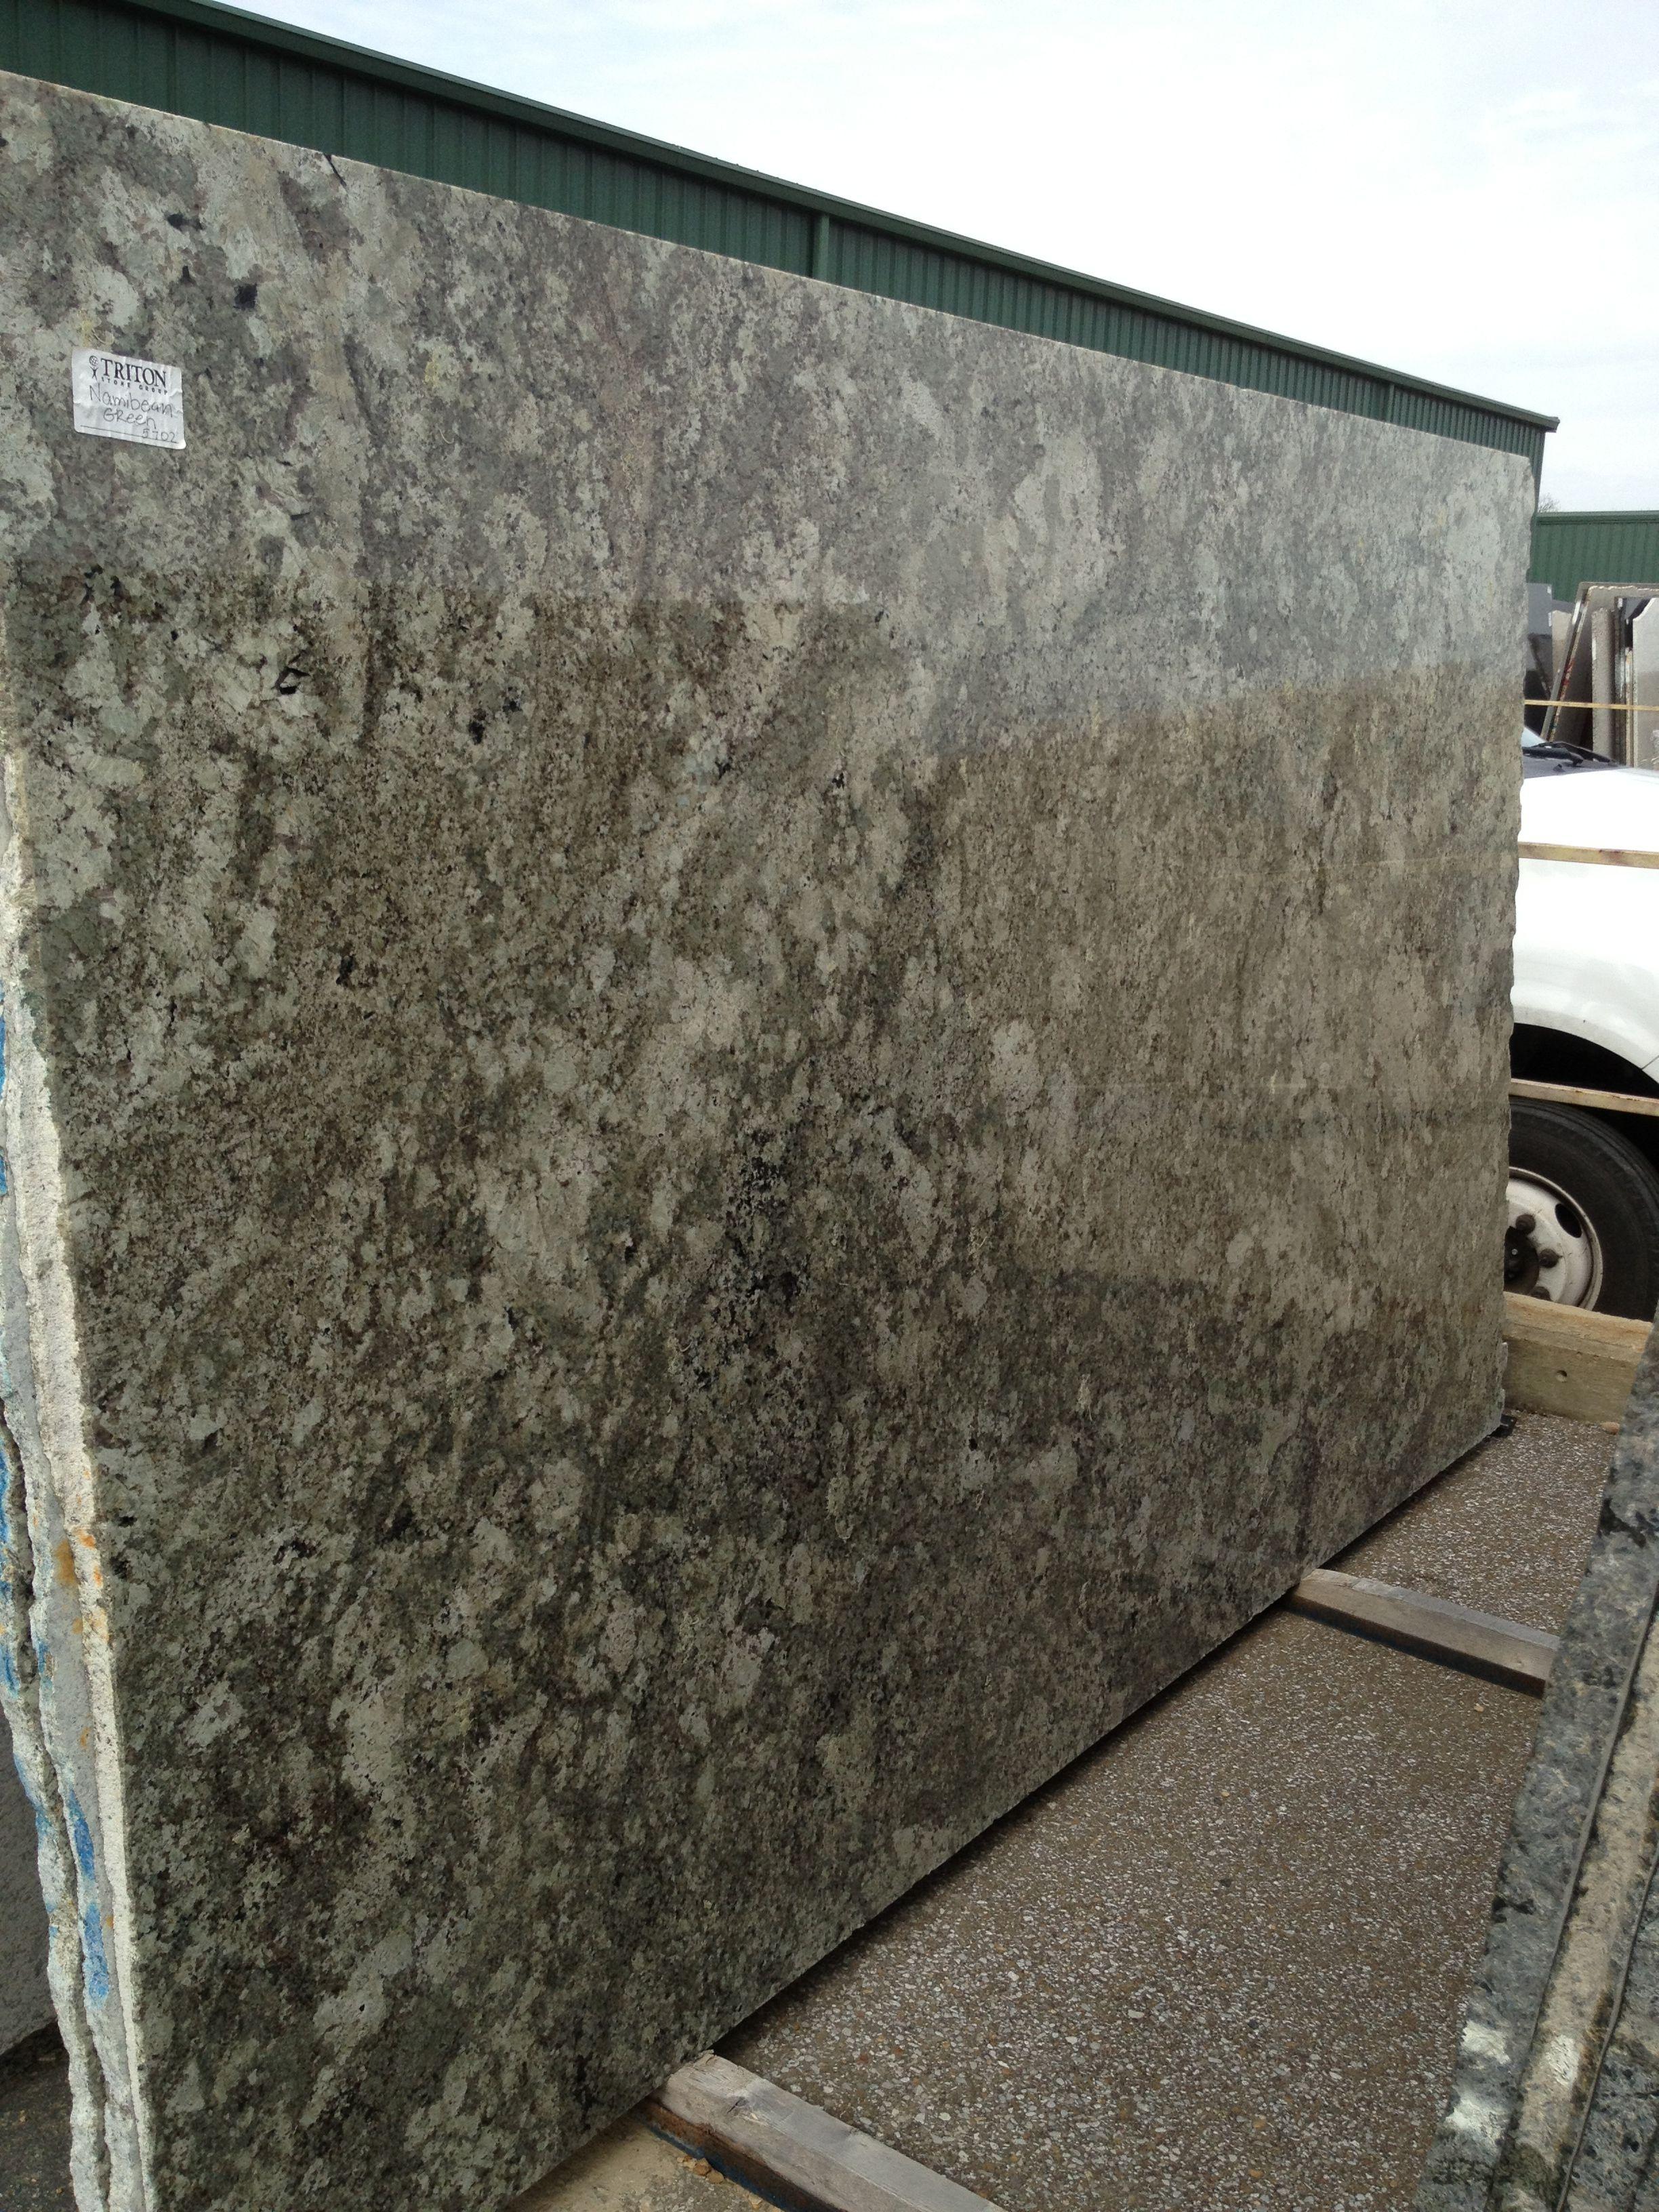 Namibian Green Granite Countertops Tub Deck Shower Bench Shampoo Niche Green Granite Green Granite Countertops Granite Countertops